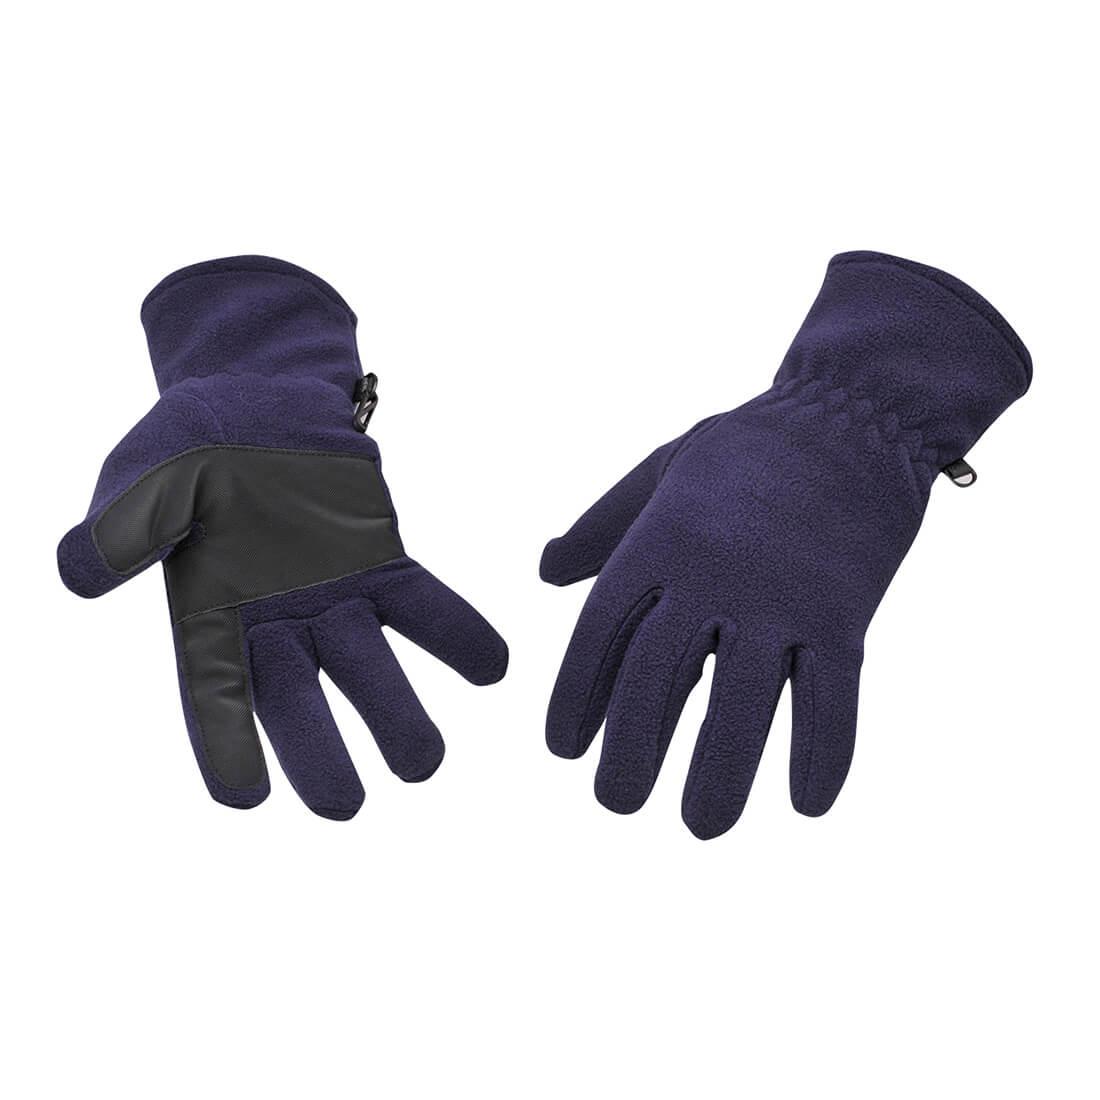 Image of Portwest Fleece Gripper Gloves Navy One Size